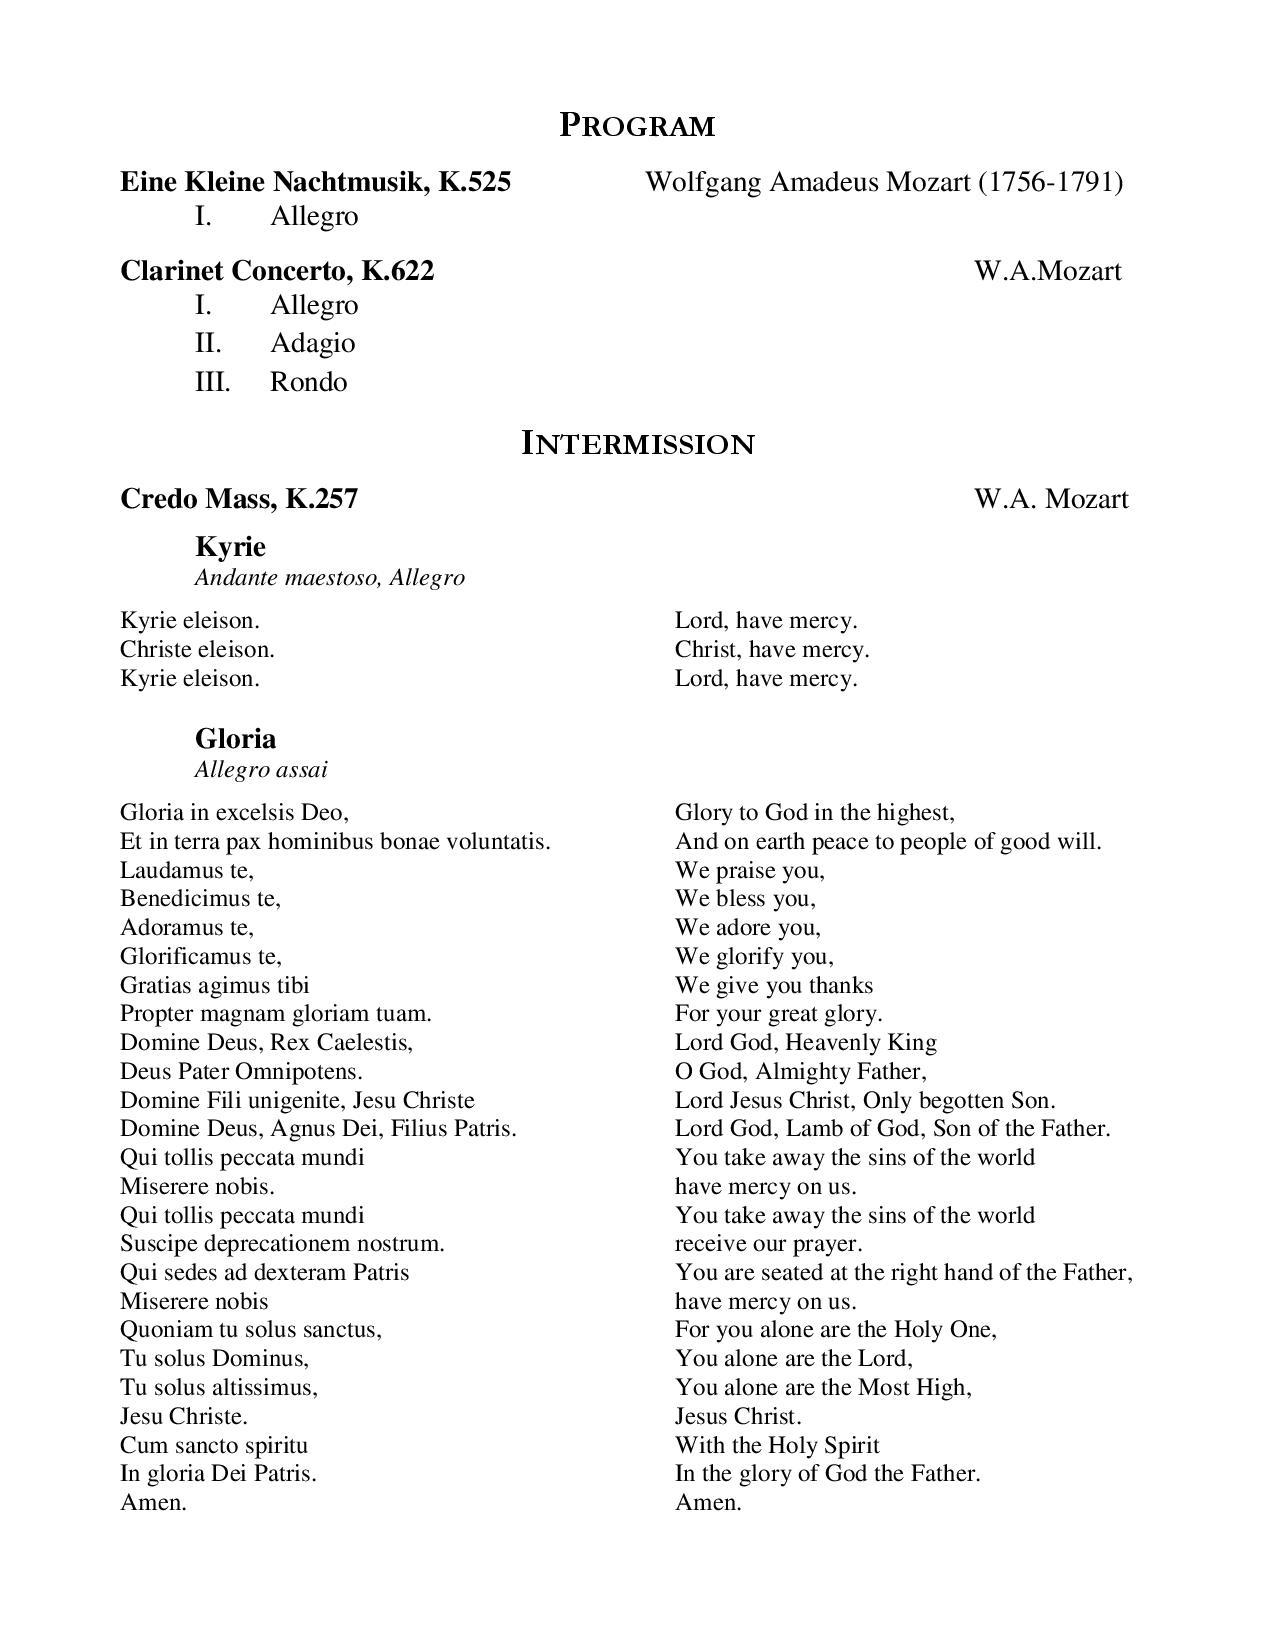 2012-04-29 Program Final-page-003.jpg